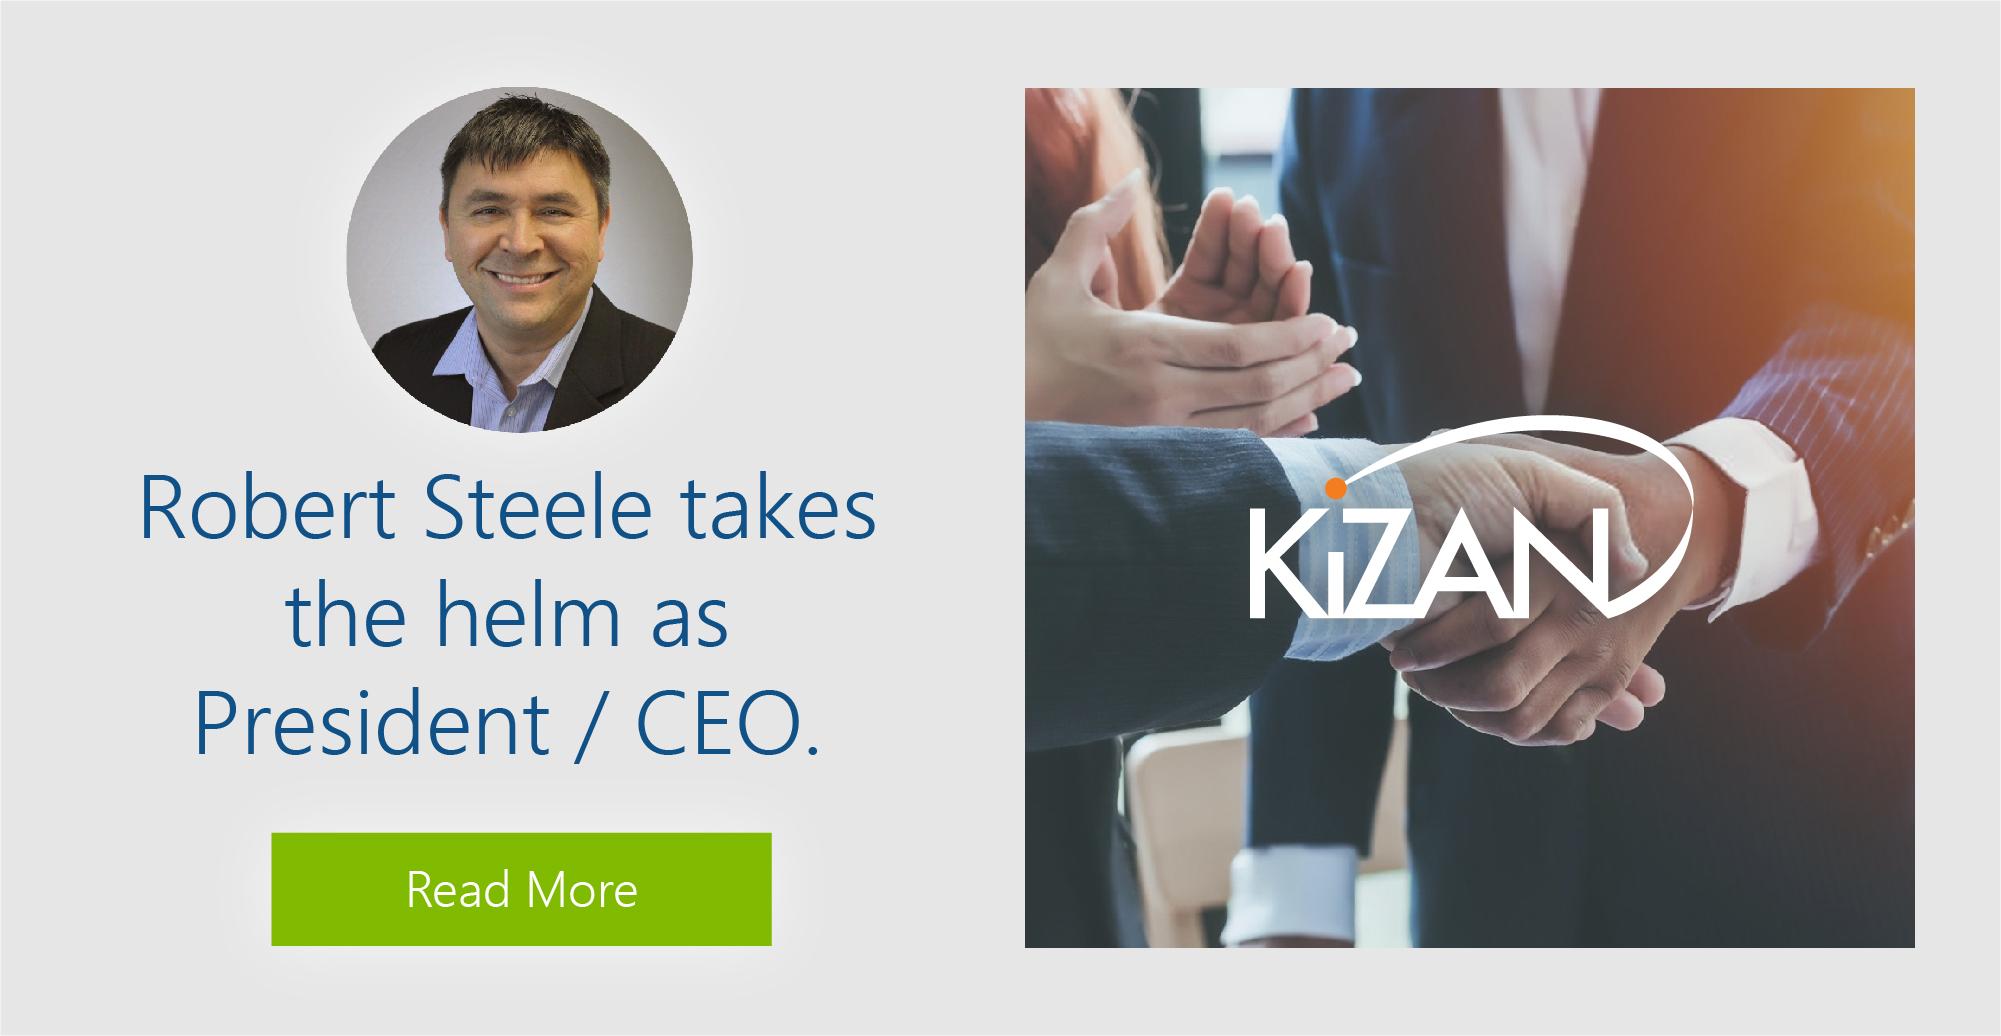 KiZAN Technologies announces executive leadership transition.